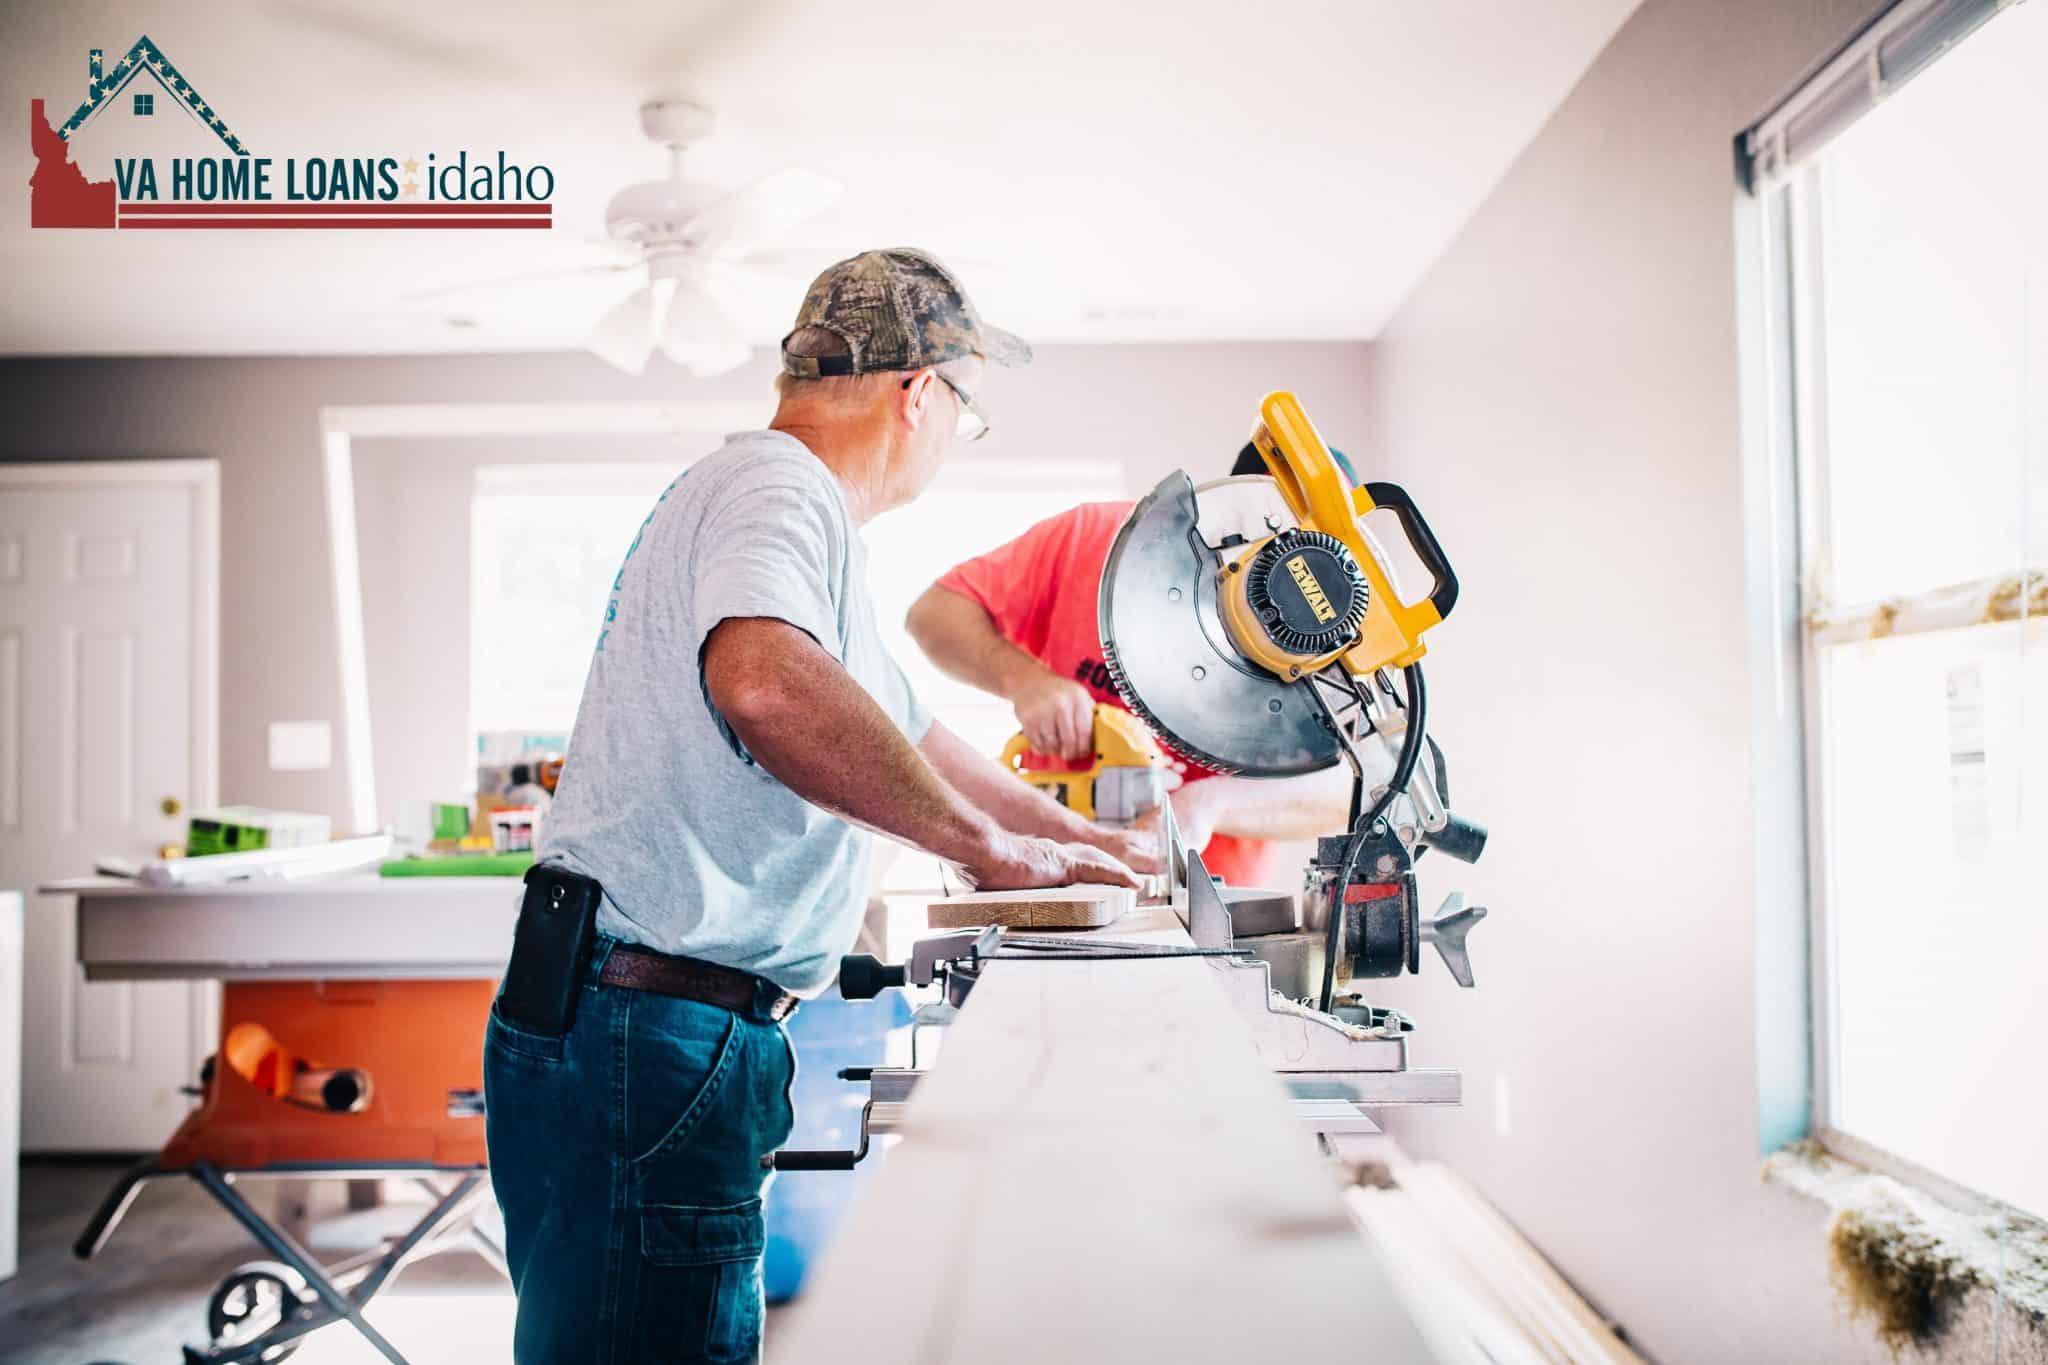 Man in grey shirt cutting wood with a saw.